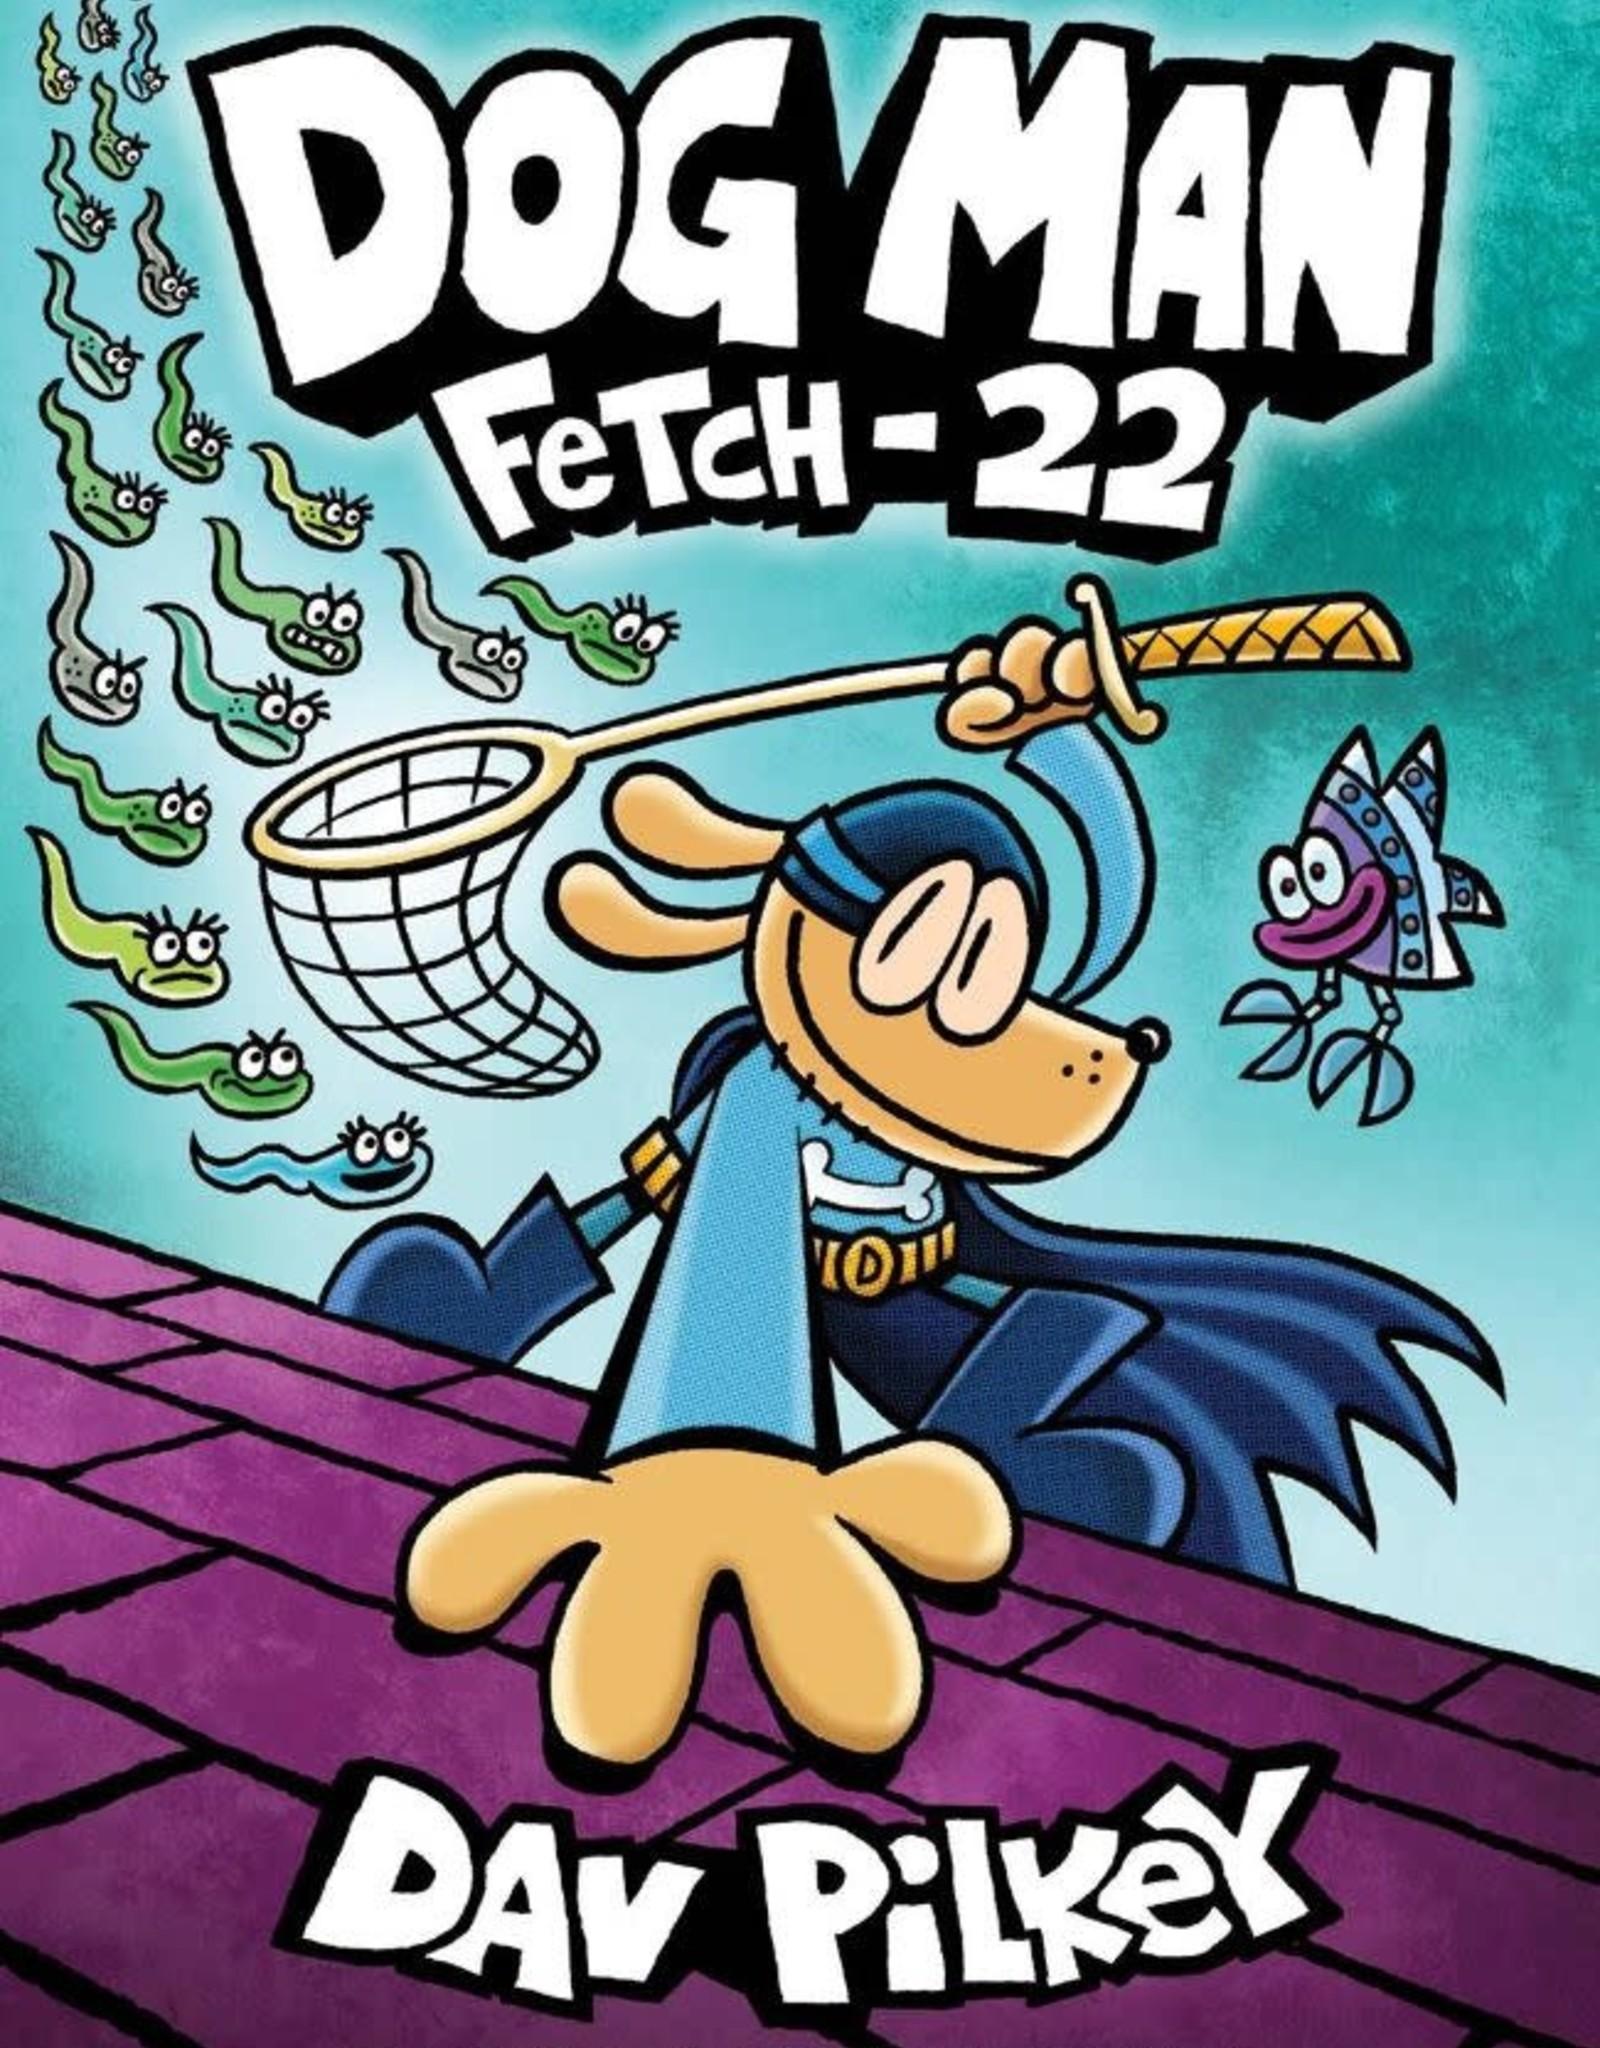 Graphix Dog Man GN Vol 08 Fetch 22